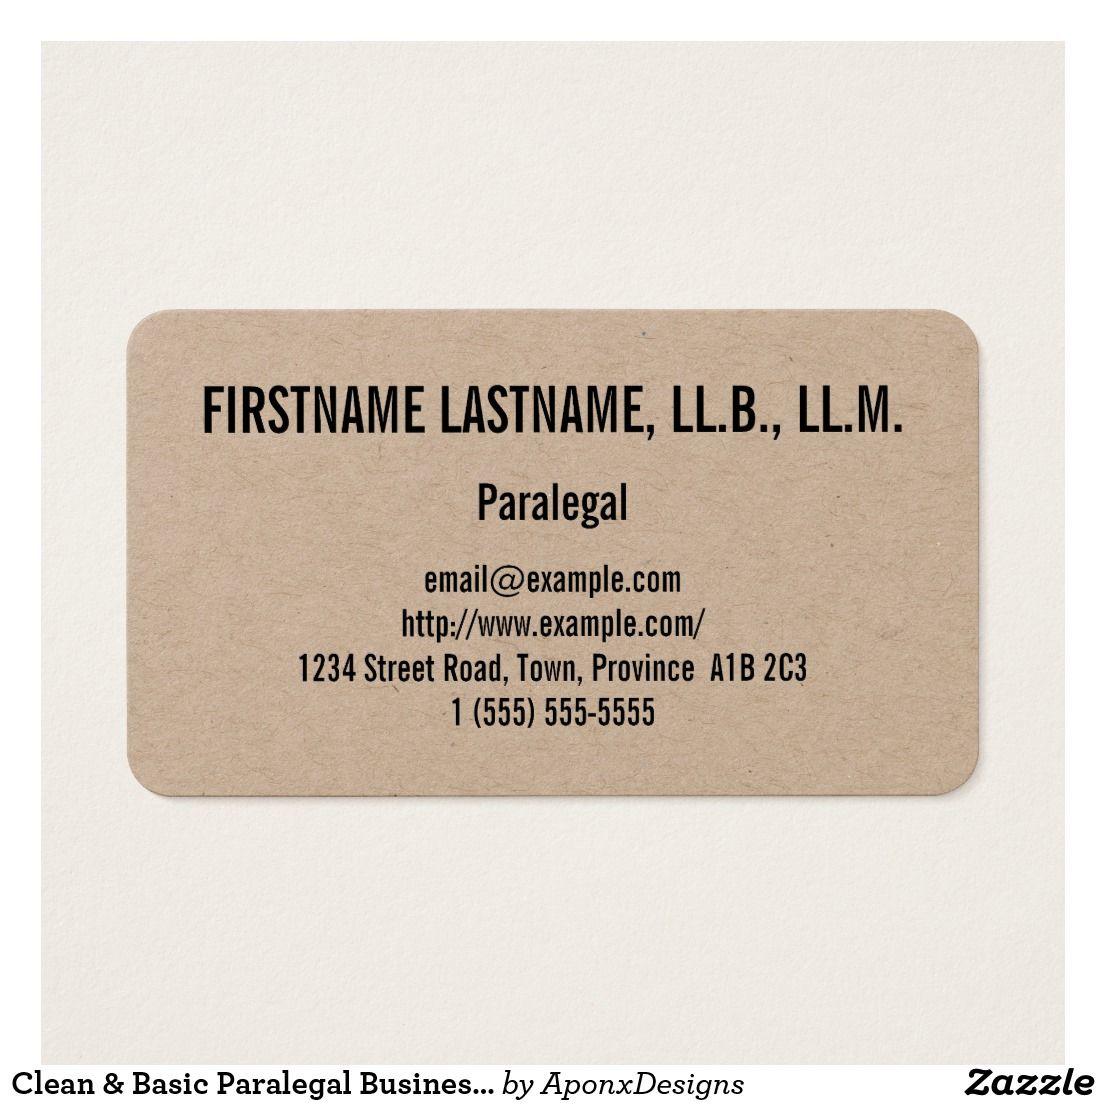 Clean Basic Paralegal Business Card Zazzle Com Paralegal Business Cards Business Card Design